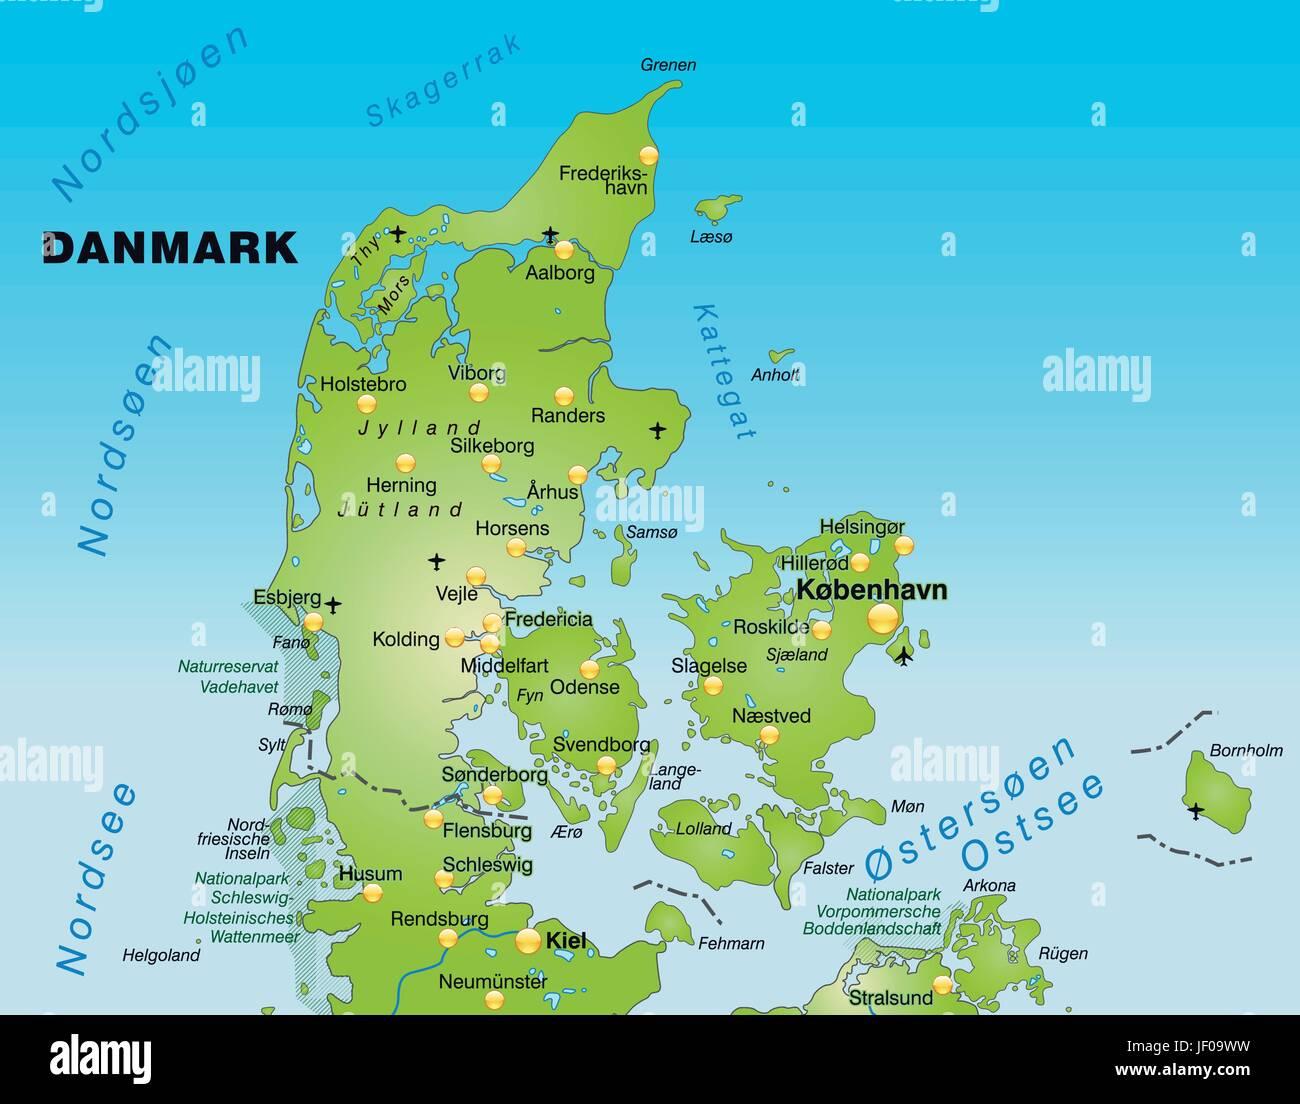 Cartina Della Danimarca.Scheda Atlas Mappa Del Mondo Mappa Danimarca Bordo